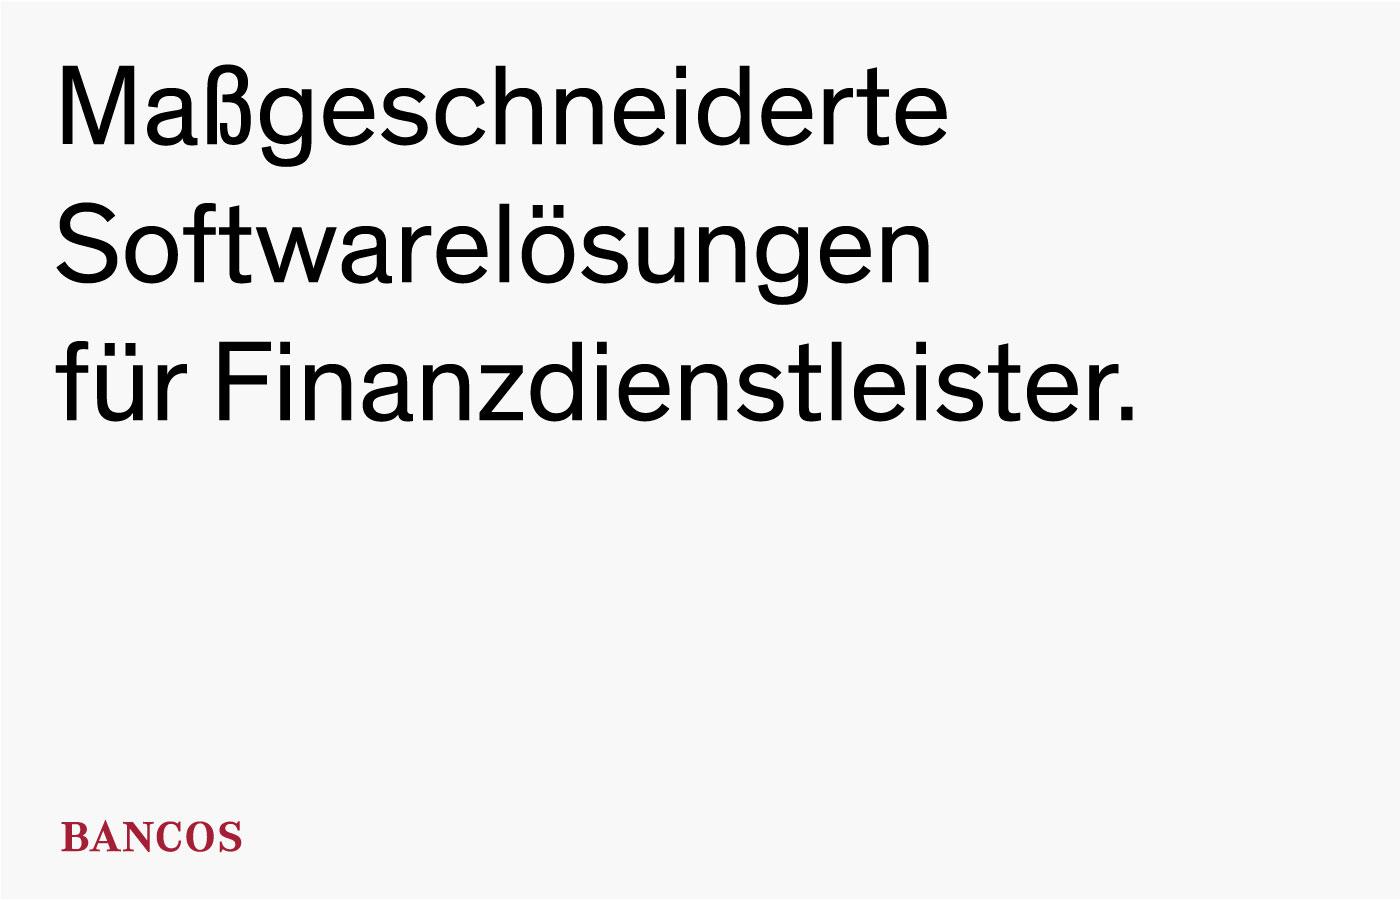 BancosBankensoftware neu inszeniert.